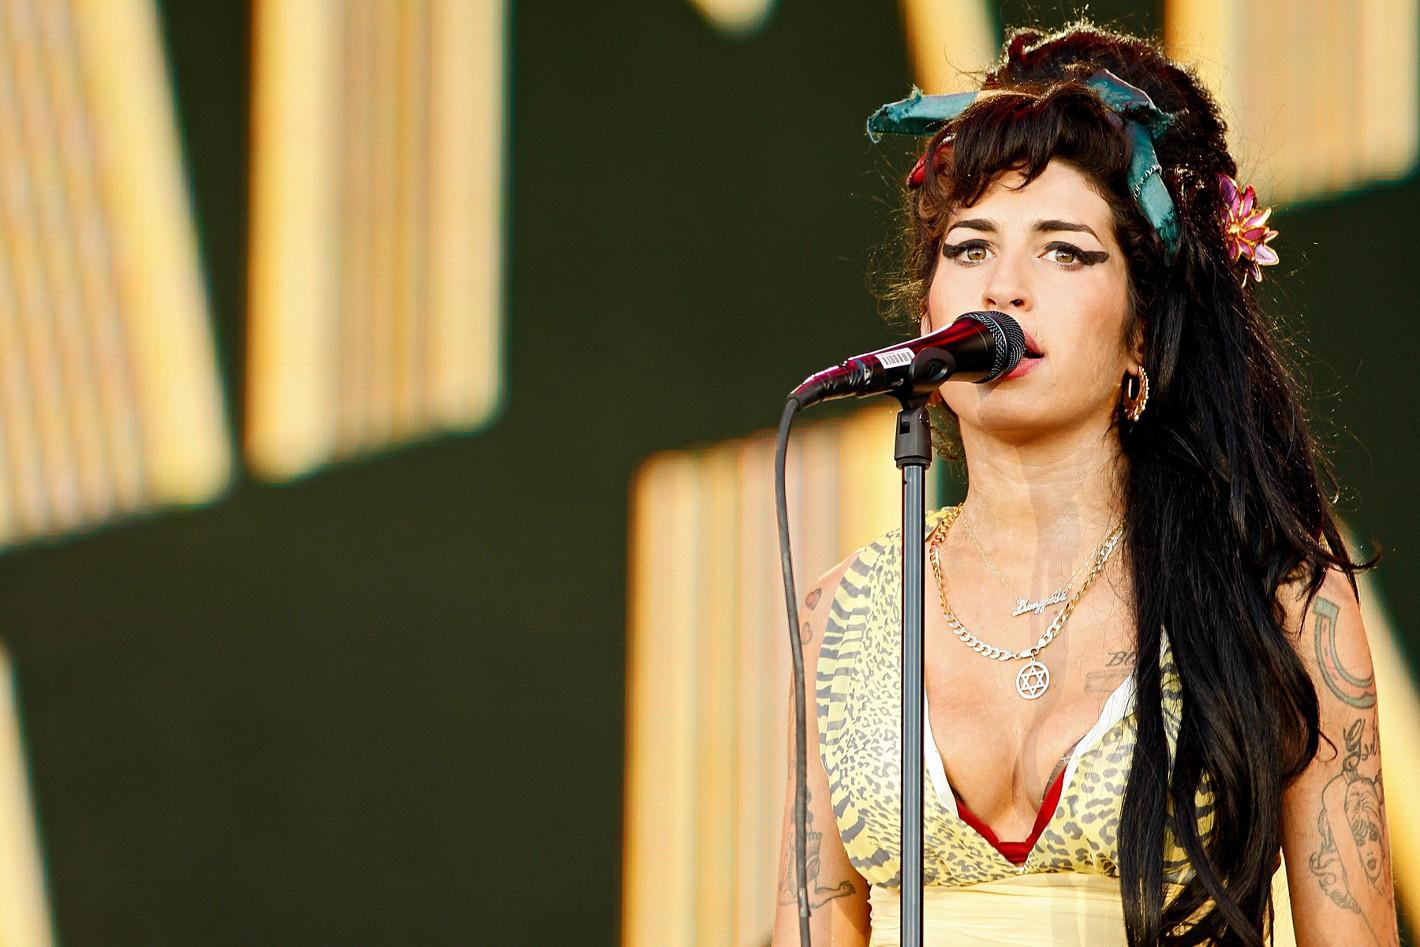 Amy naslovna